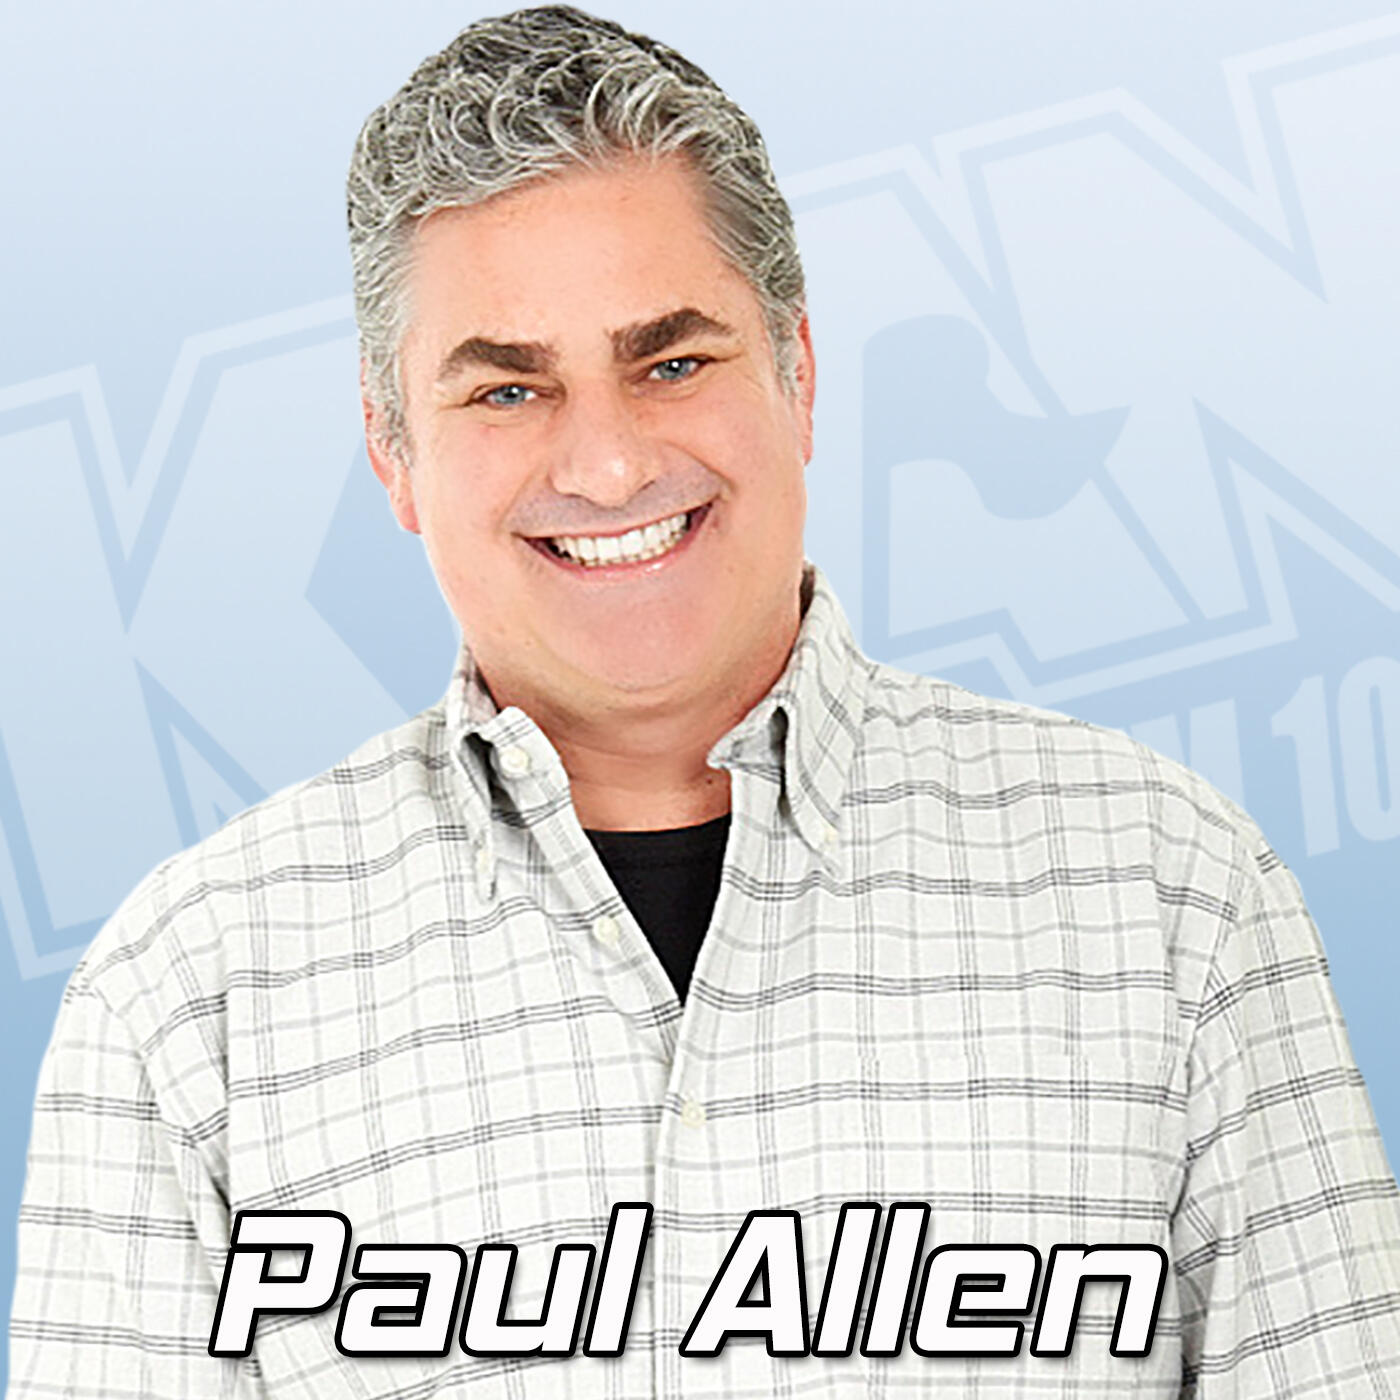 Listen to the Paul Allen - KFAN FM 100.3 Episode - #92Noon! Florio/Kyndra/McGinest/Gleeman/Burns on iHeartRadio | iHeartRadio